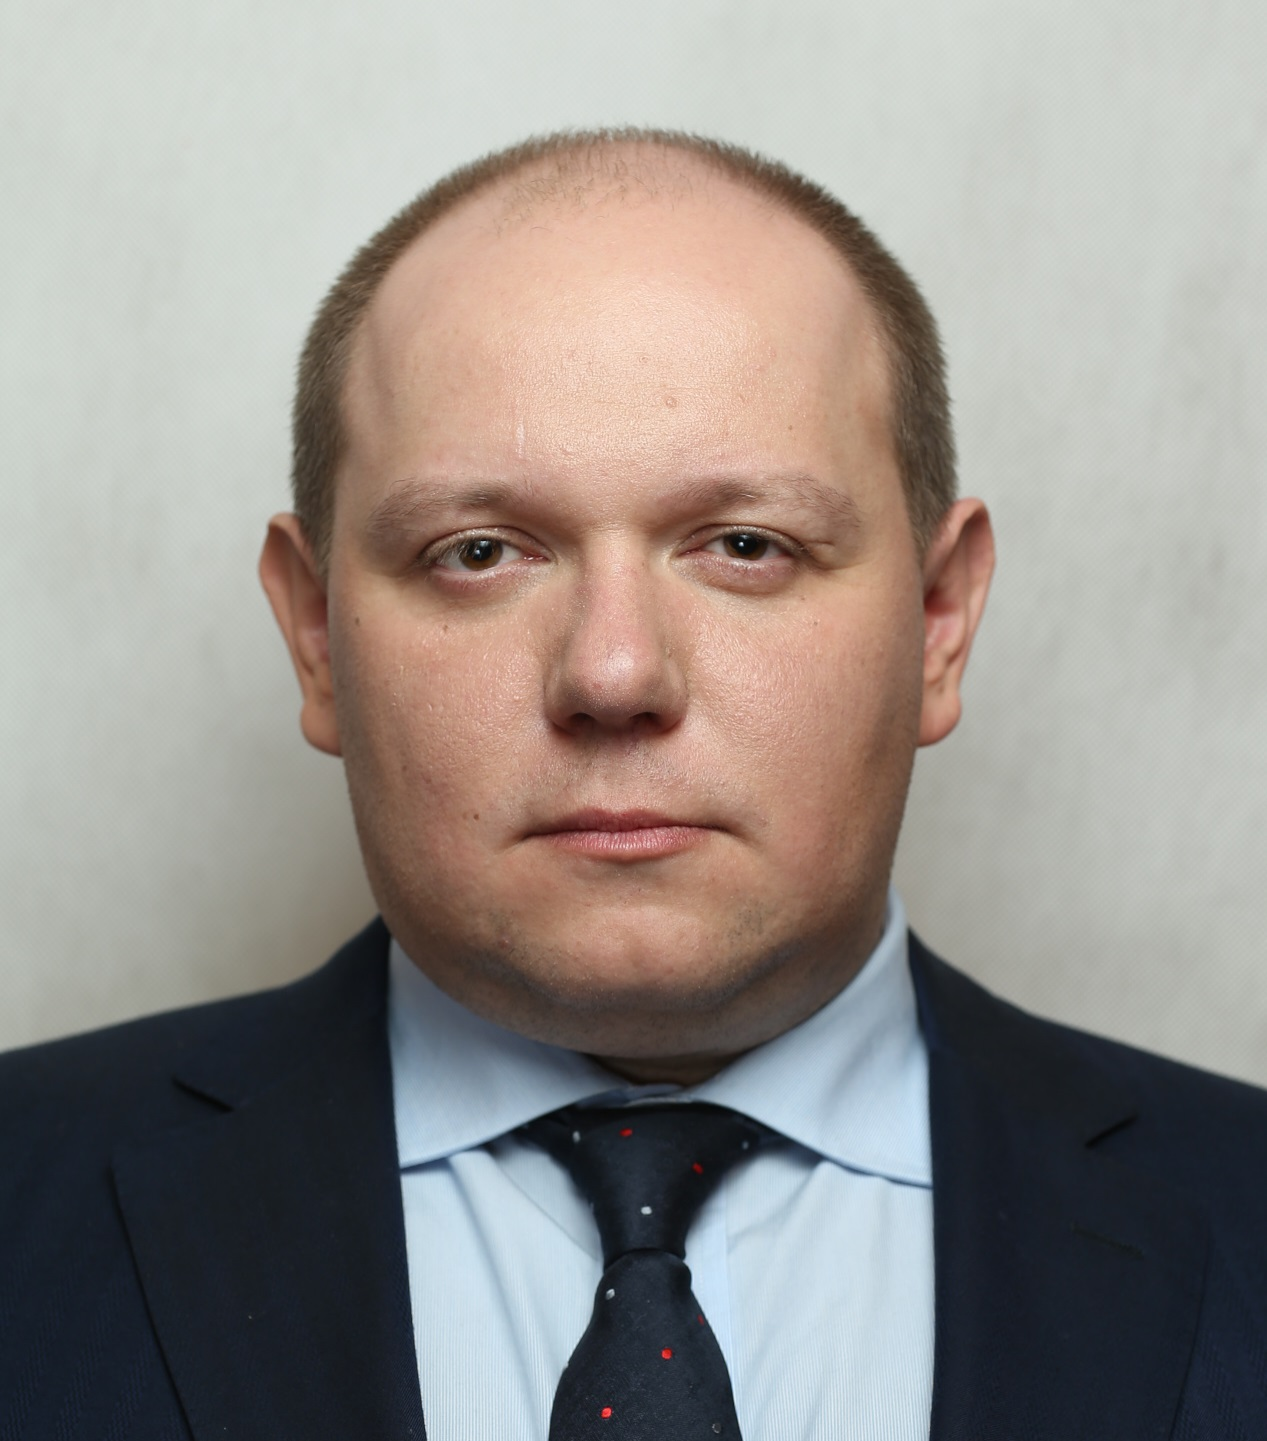 Зеленский Владимир